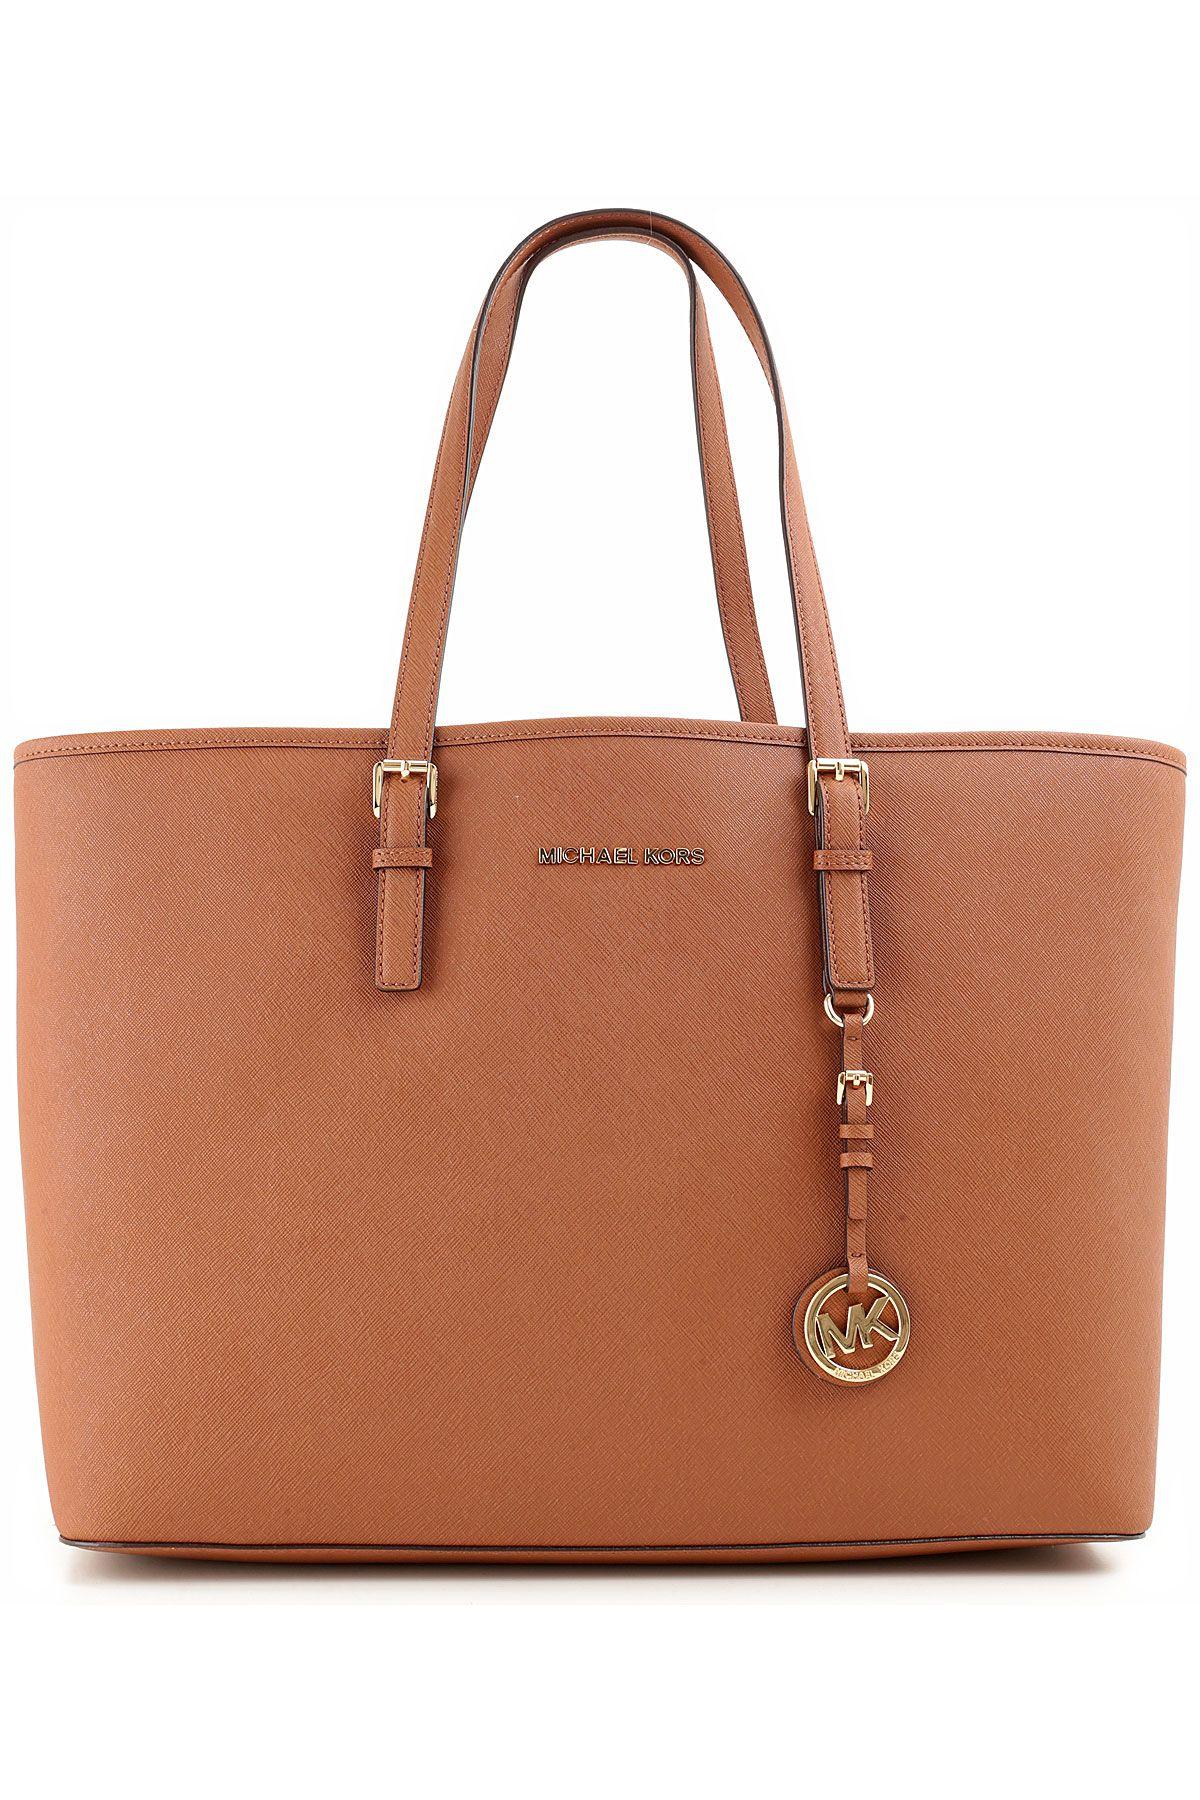 Handbags Michael Kors, Style code: 30s3gtvt6l-230- | Michael kors ...